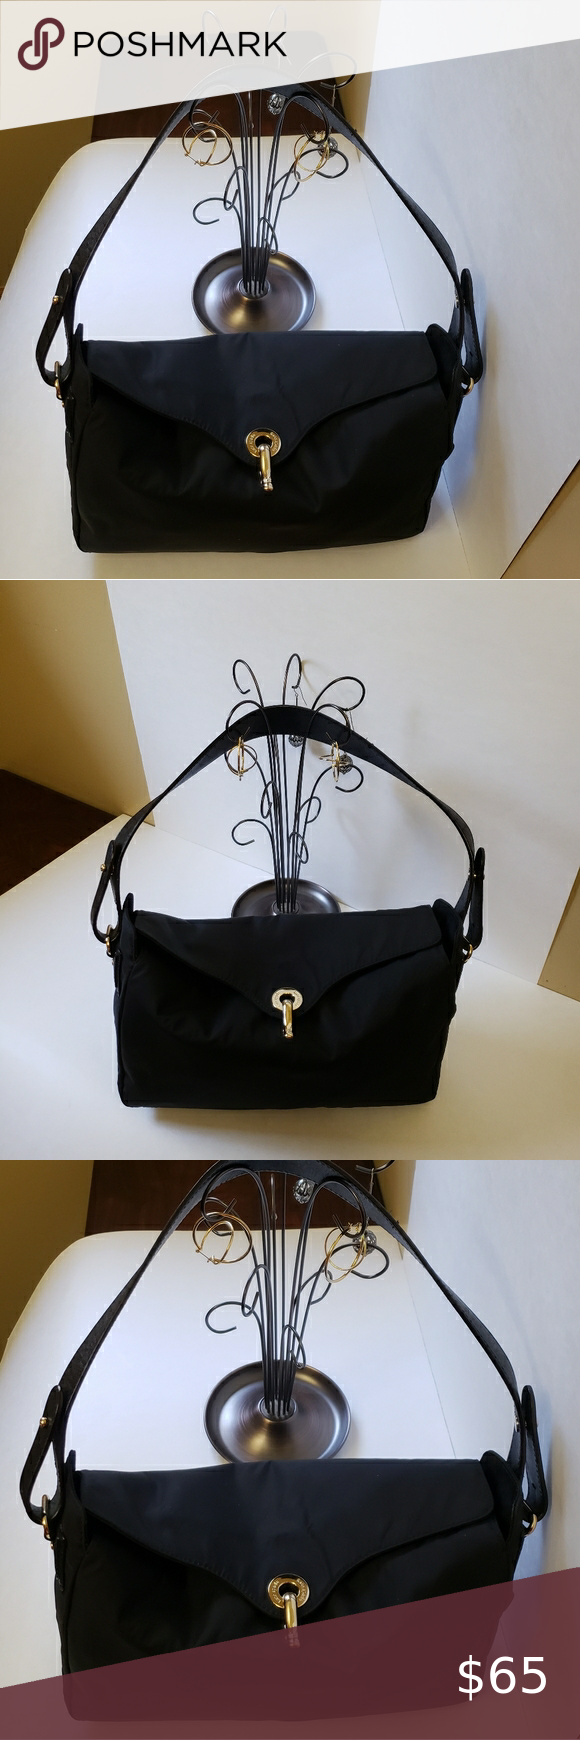 Euc Kate Spade Purse Super Cute Black Handbag Black Handbags Kate Spade Purse Kate Spade Purse Black